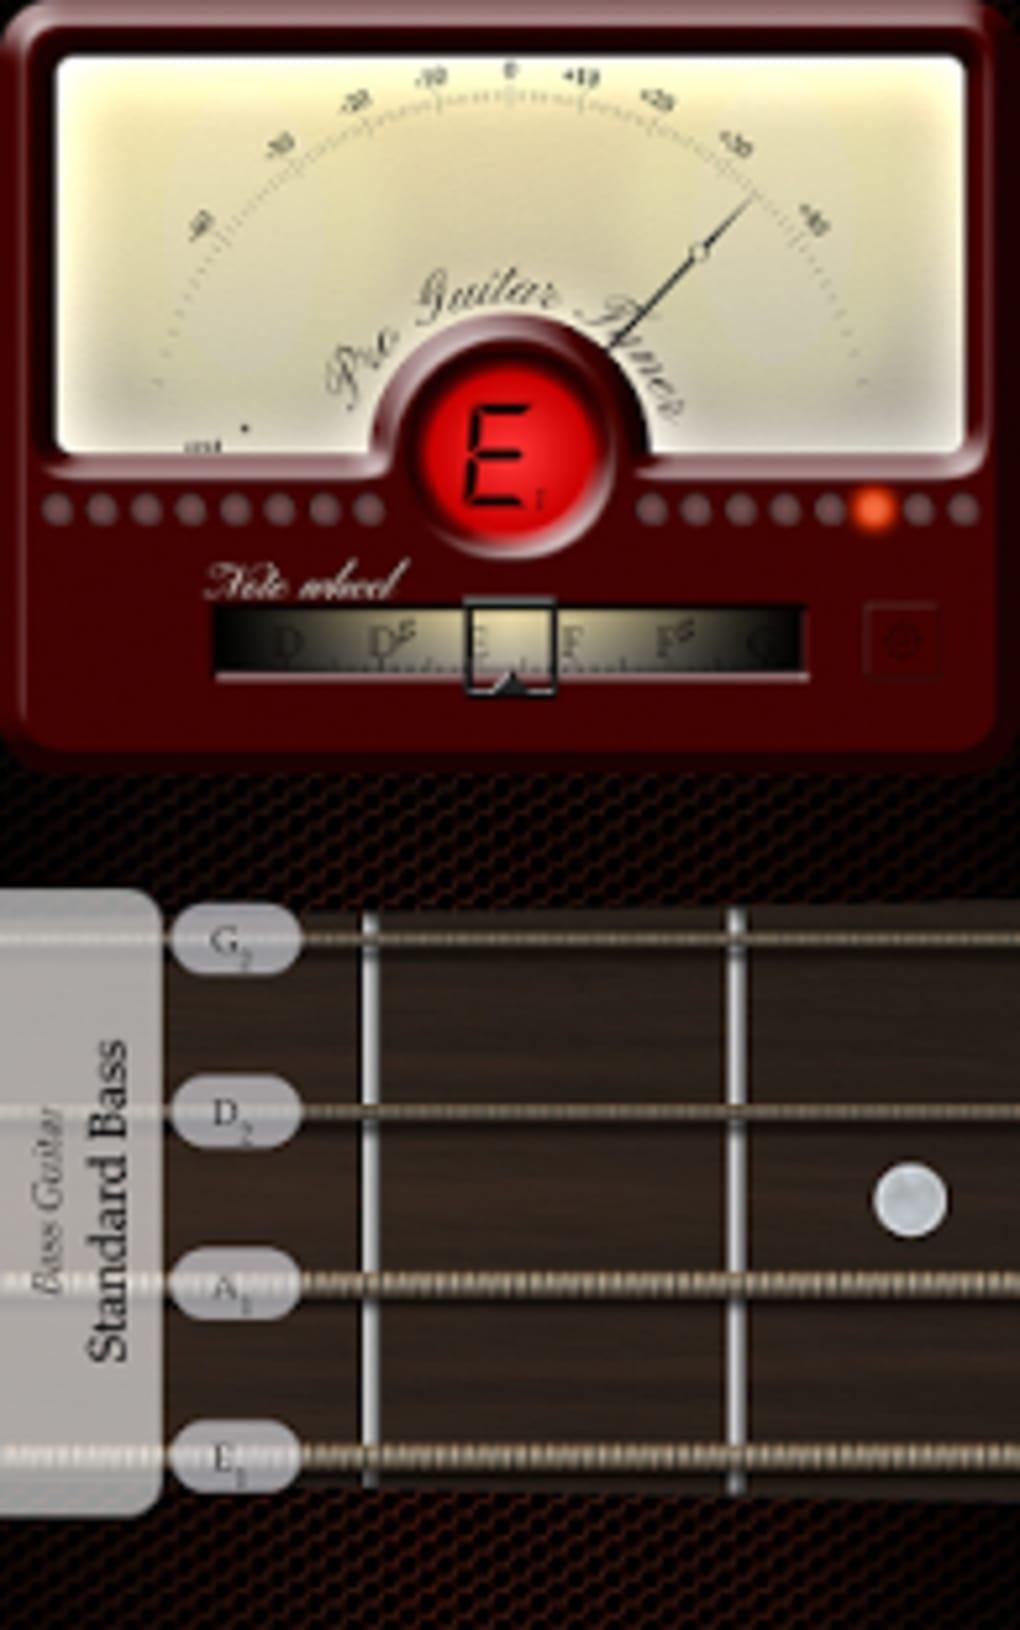 pro guitar tuner for android download. Black Bedroom Furniture Sets. Home Design Ideas